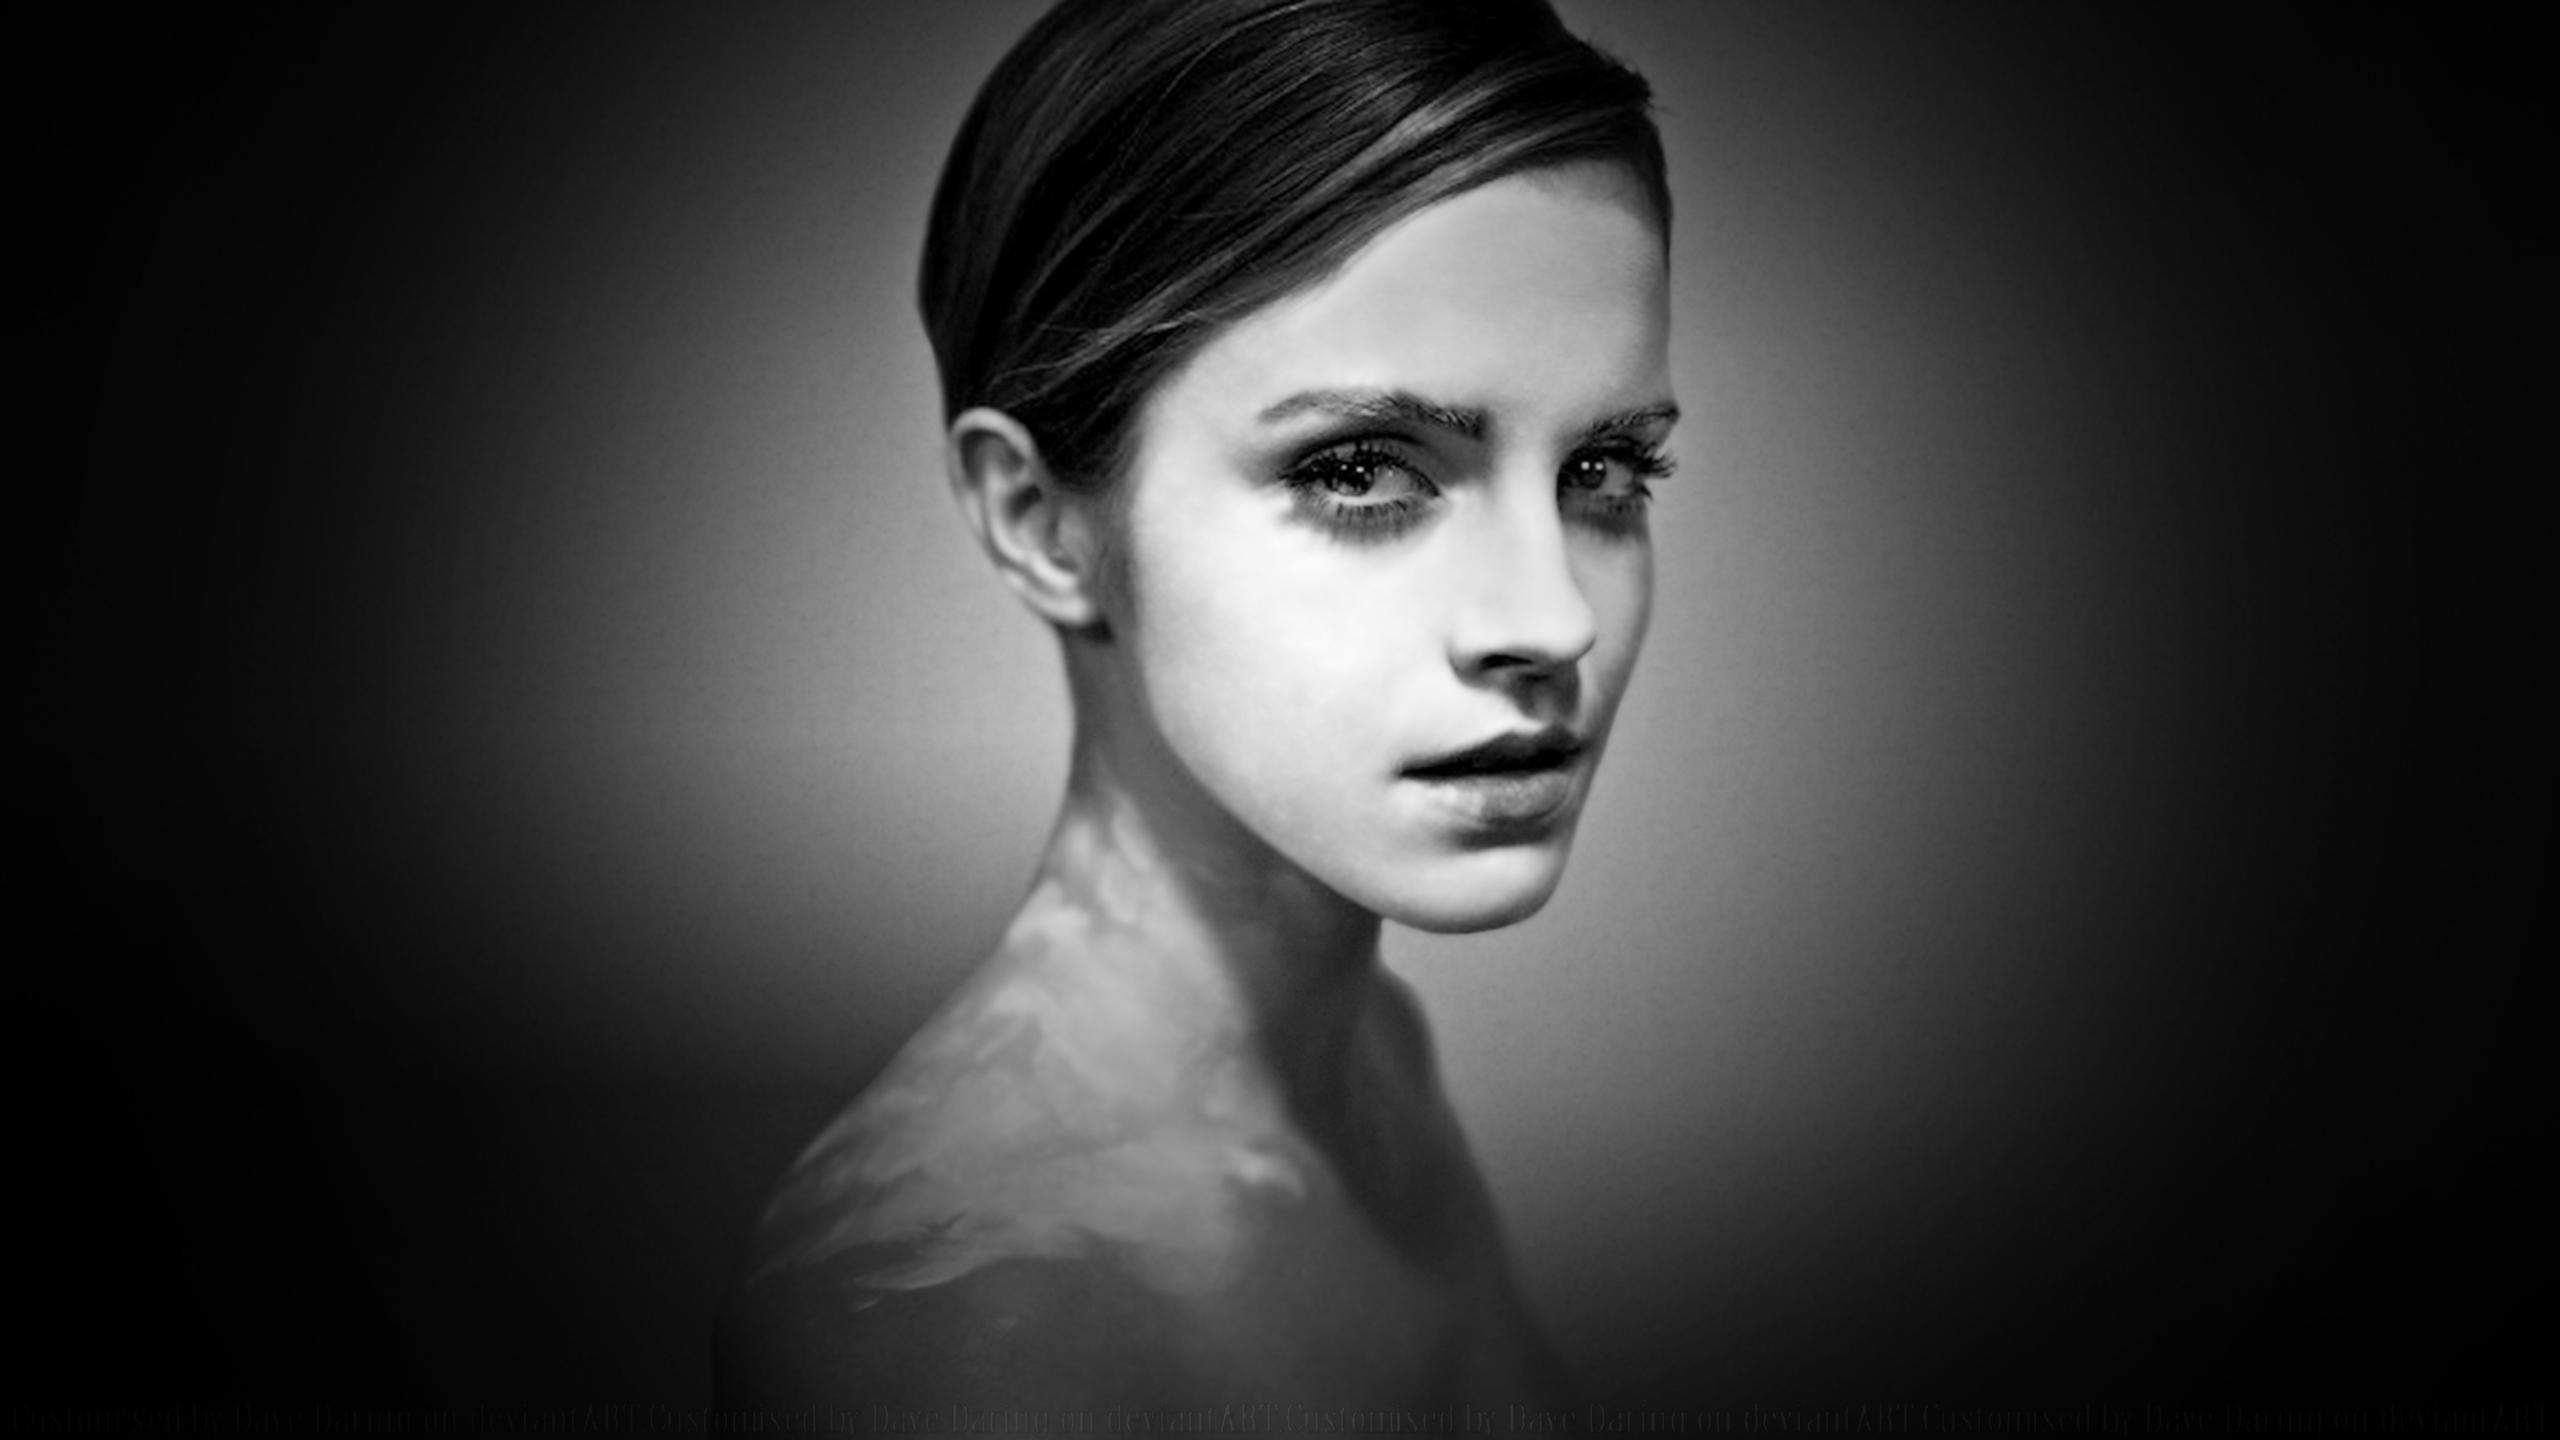 Emma Watson Glamour Portrait II by Dave-Daring on DeviantArt